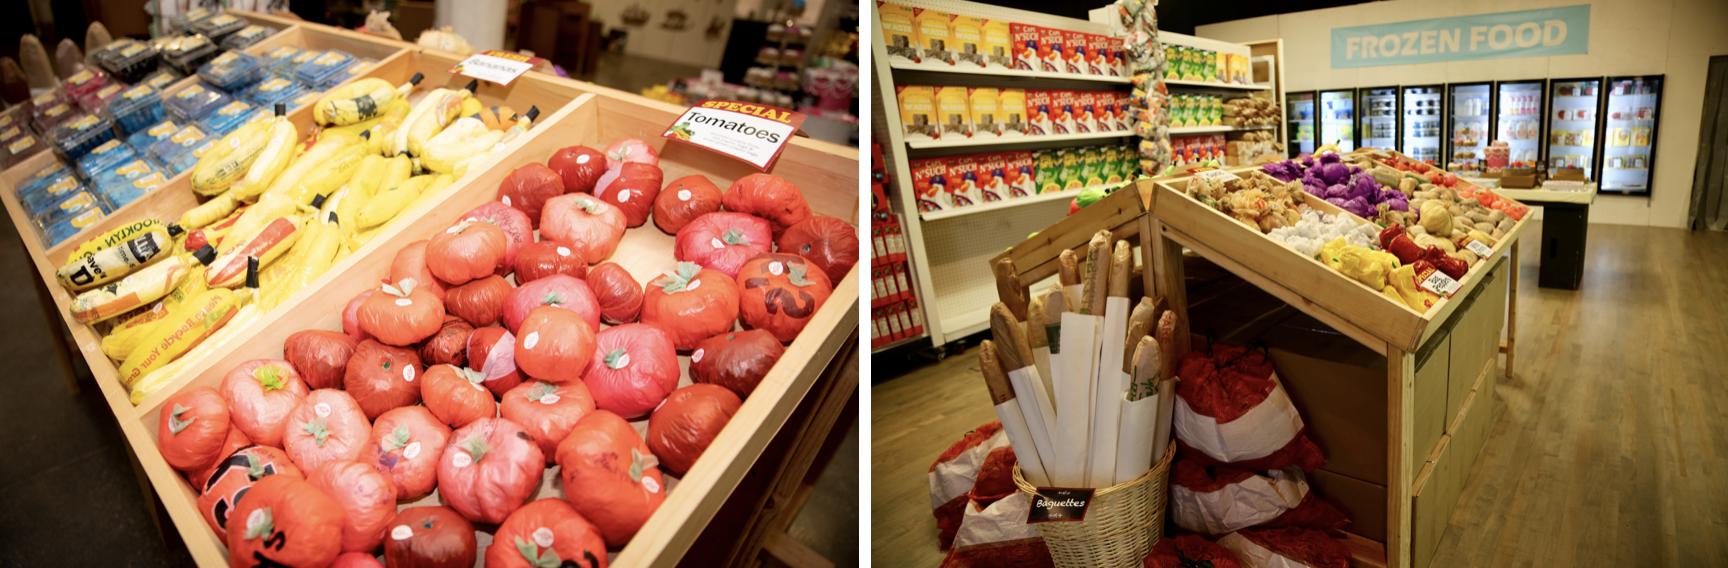 The Plastic Bag Store. Photo by Maria Baranova-Suzuki. Courtesy of Times Square Arts.